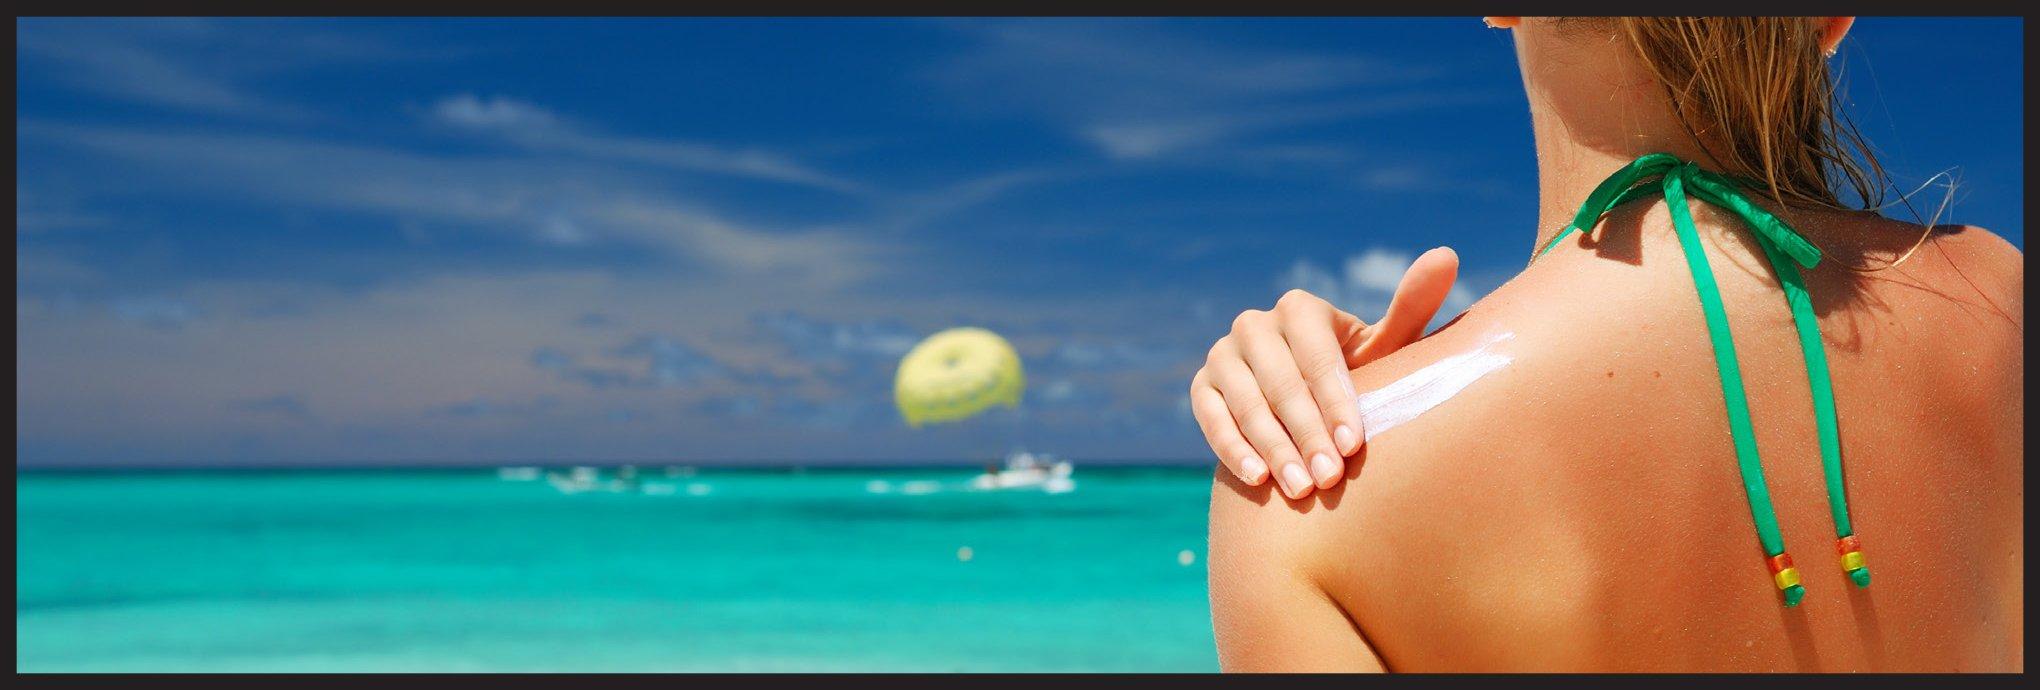 marketing-to-women-sun-care-market